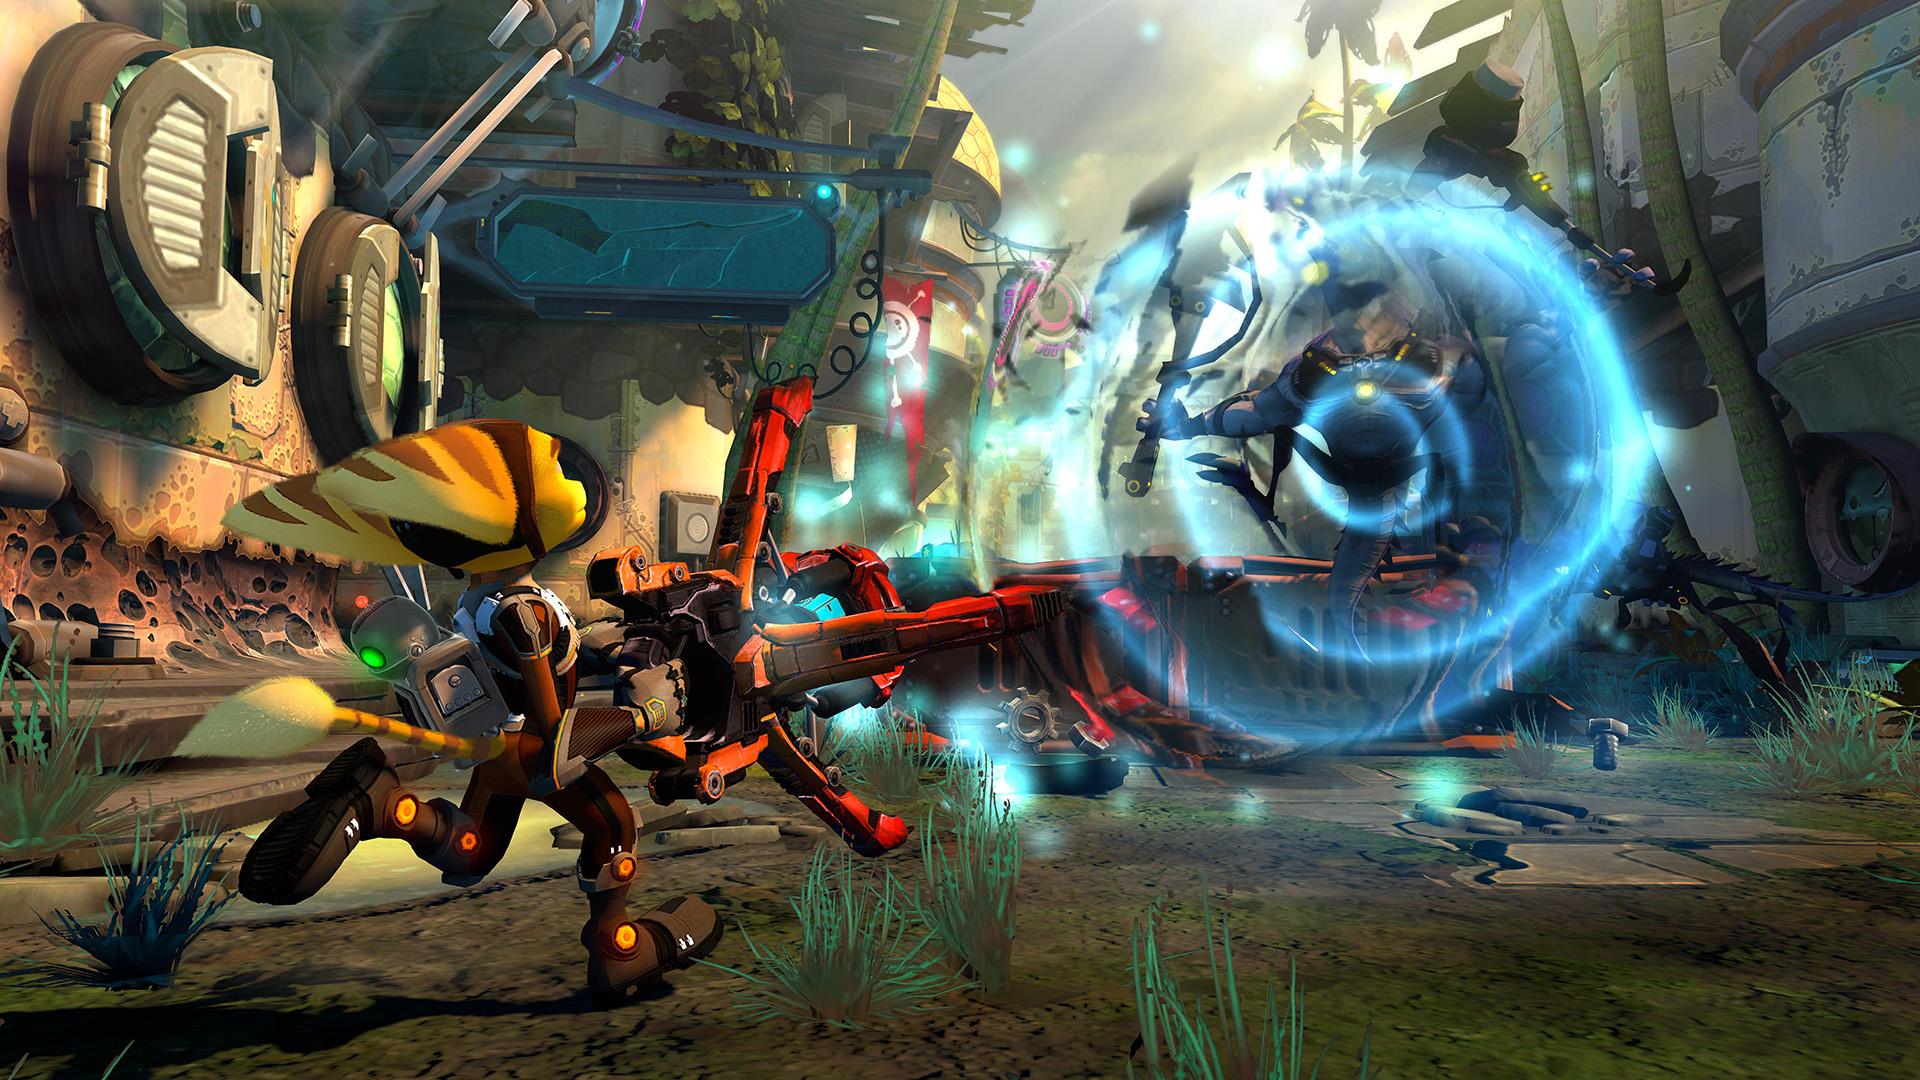 Ratchet & Clank reviennent sur Playstation 3